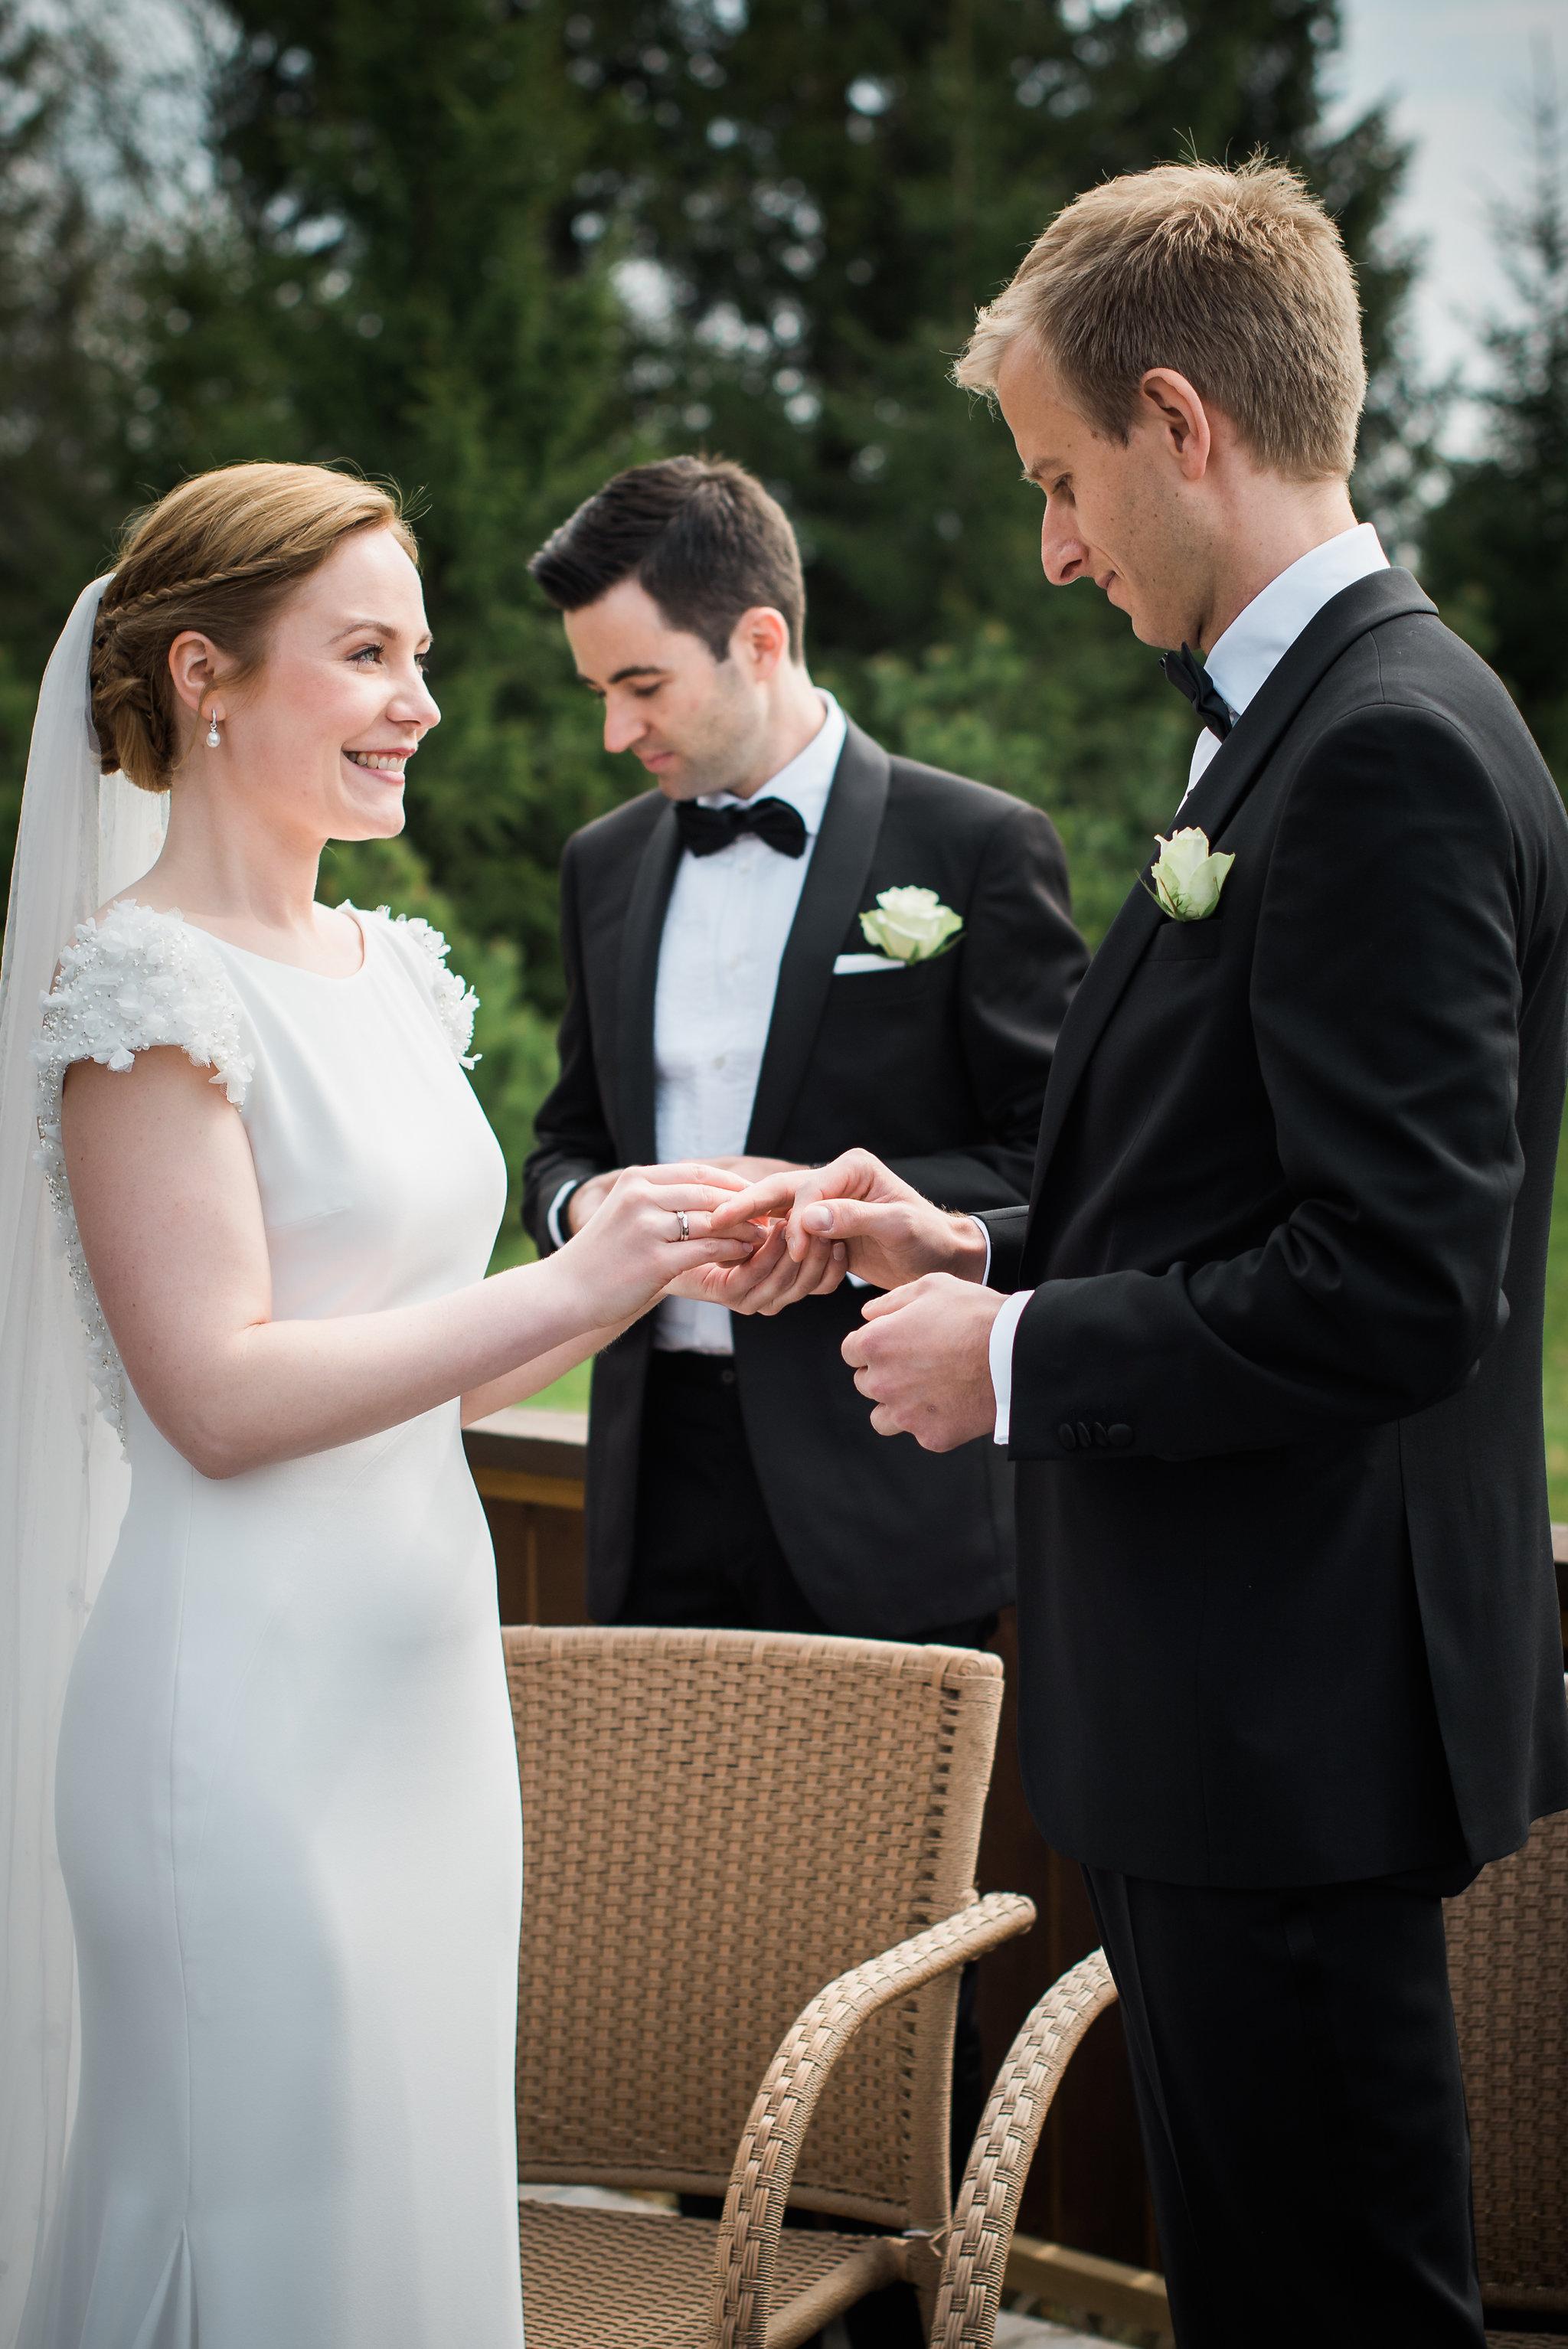 Pixlight-Bryllup-Nina-Thorbjorn365fotograf-holmekolen-oslo.jpg